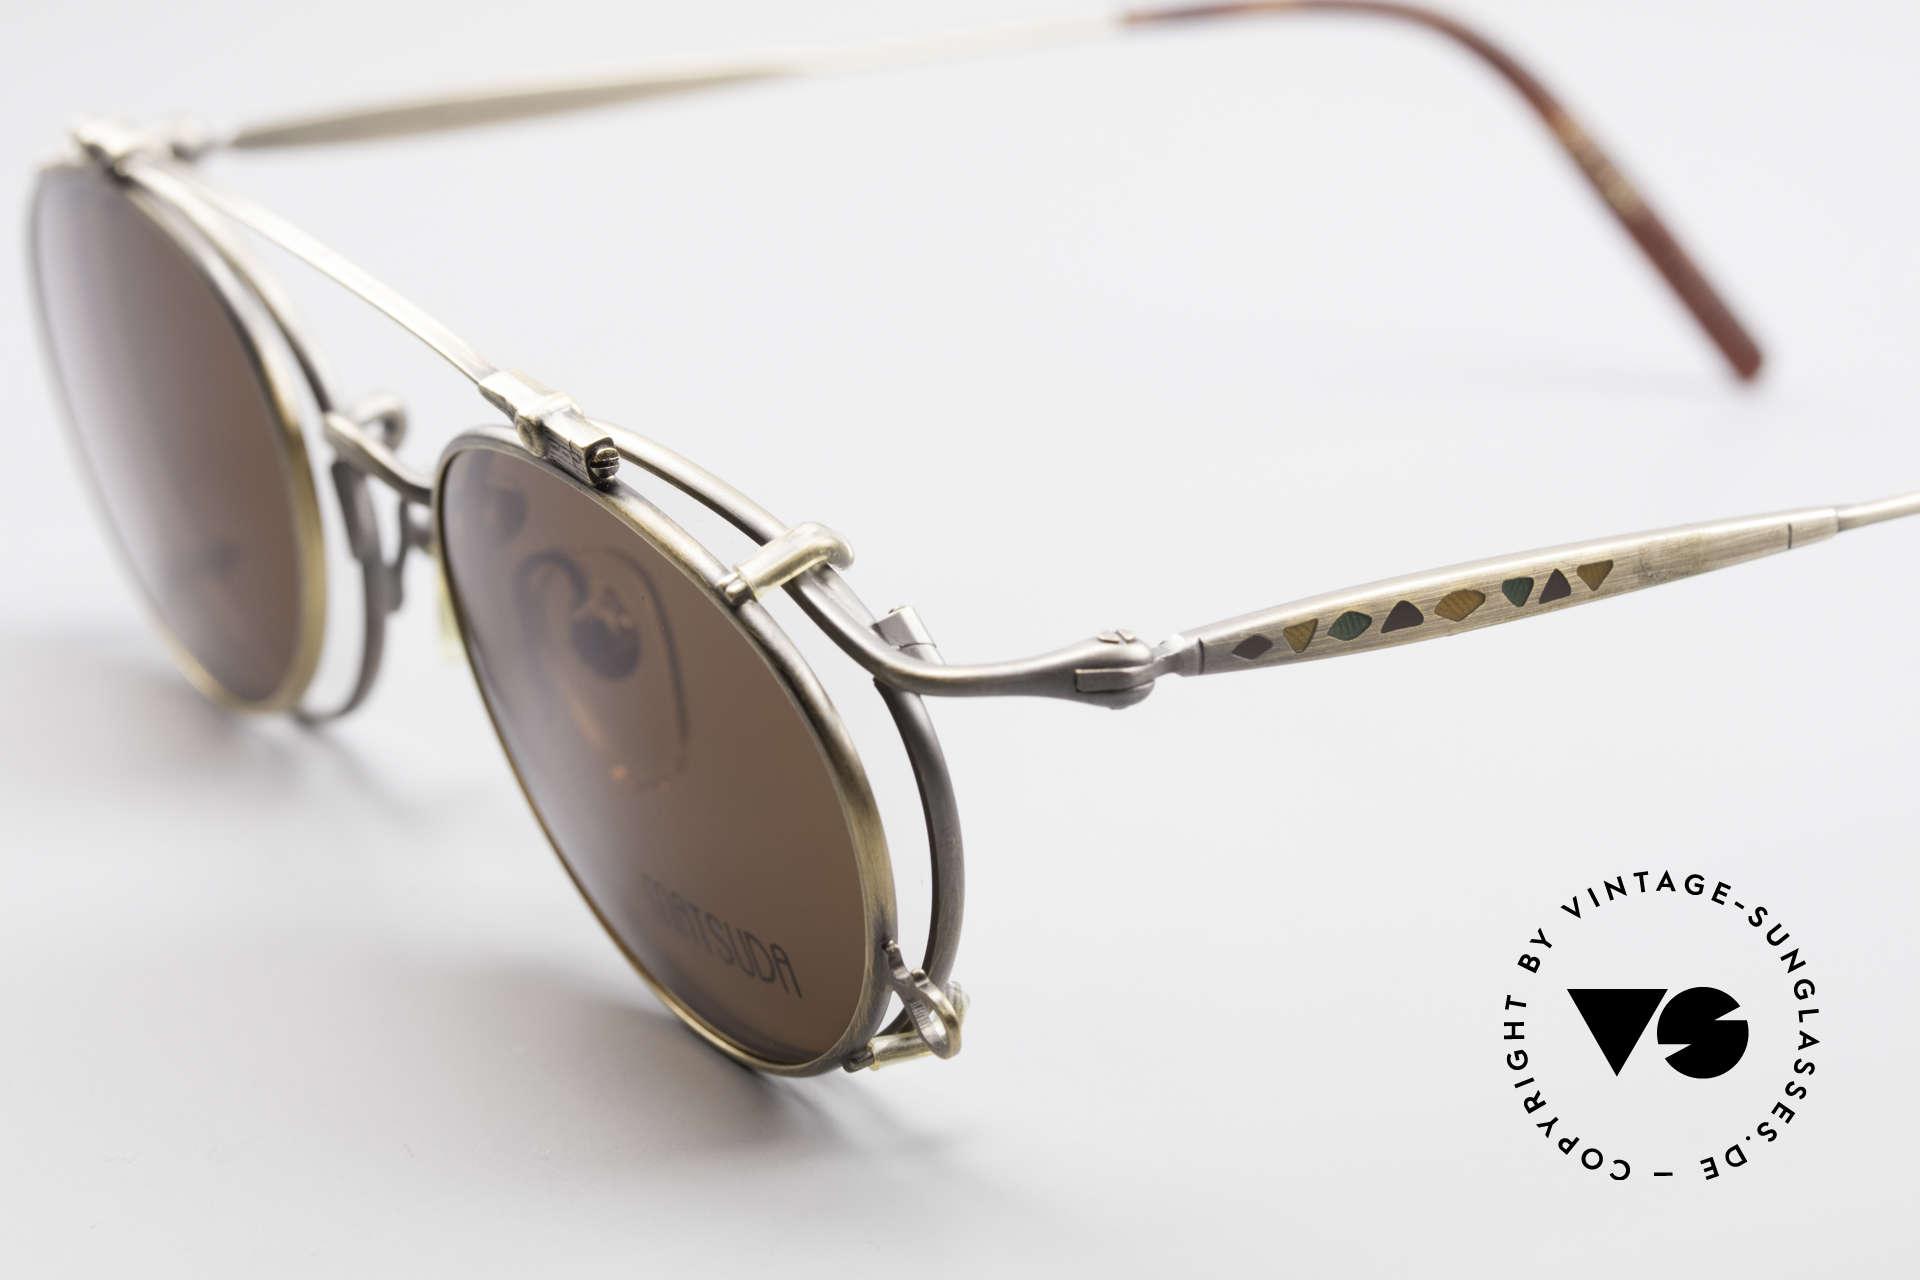 Matsuda 2853 Steampunk Vintage Shades, e.g. Sarah Connor wore Matsuda shades in Terminator 2, Made for Men